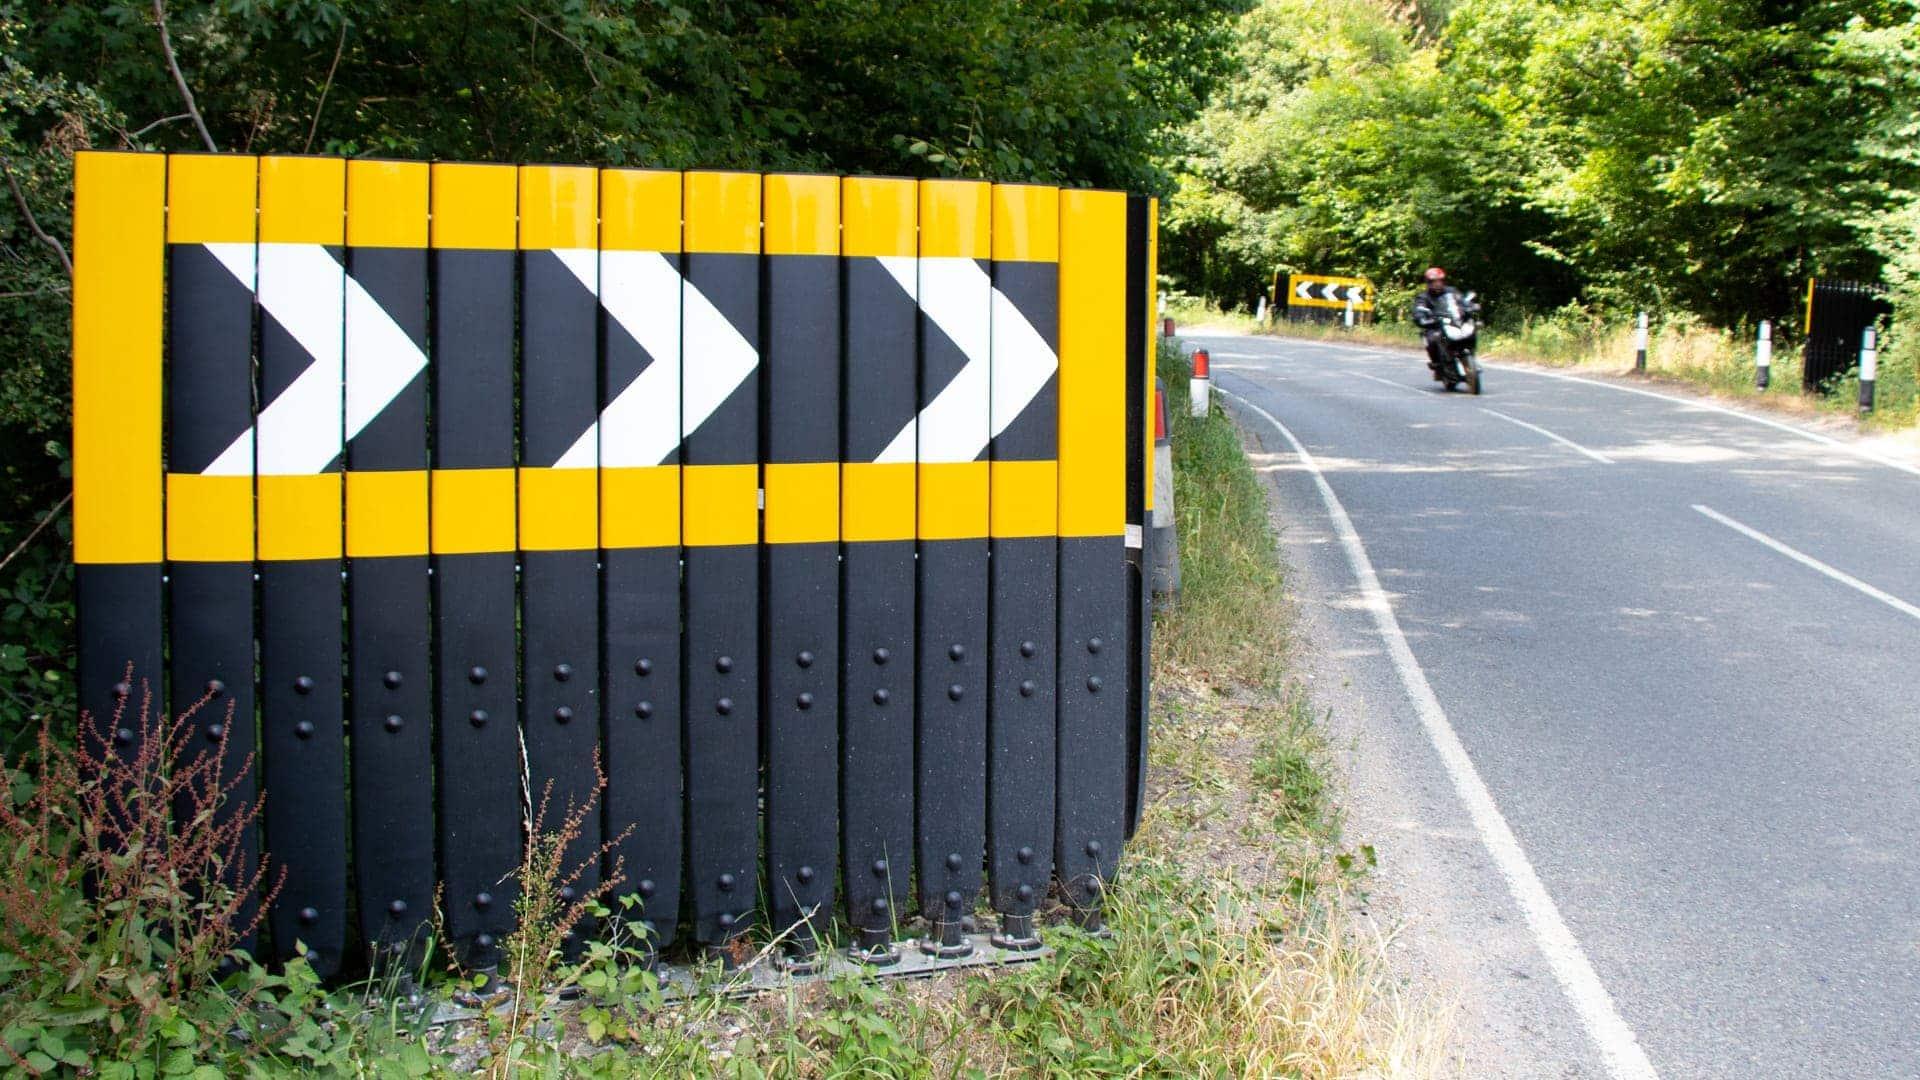 Evo Chev RSRB Chevron road sign